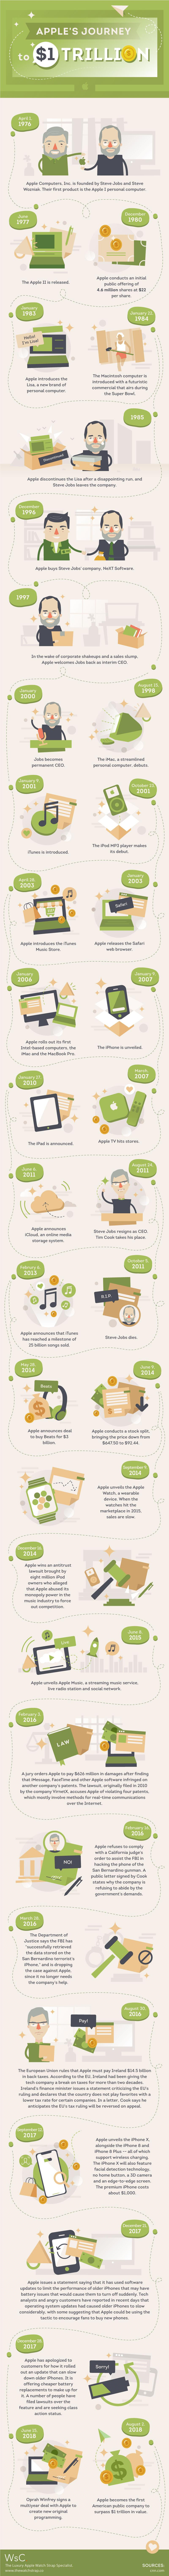 Apple-Journey-to-1-Trillion-Infographic